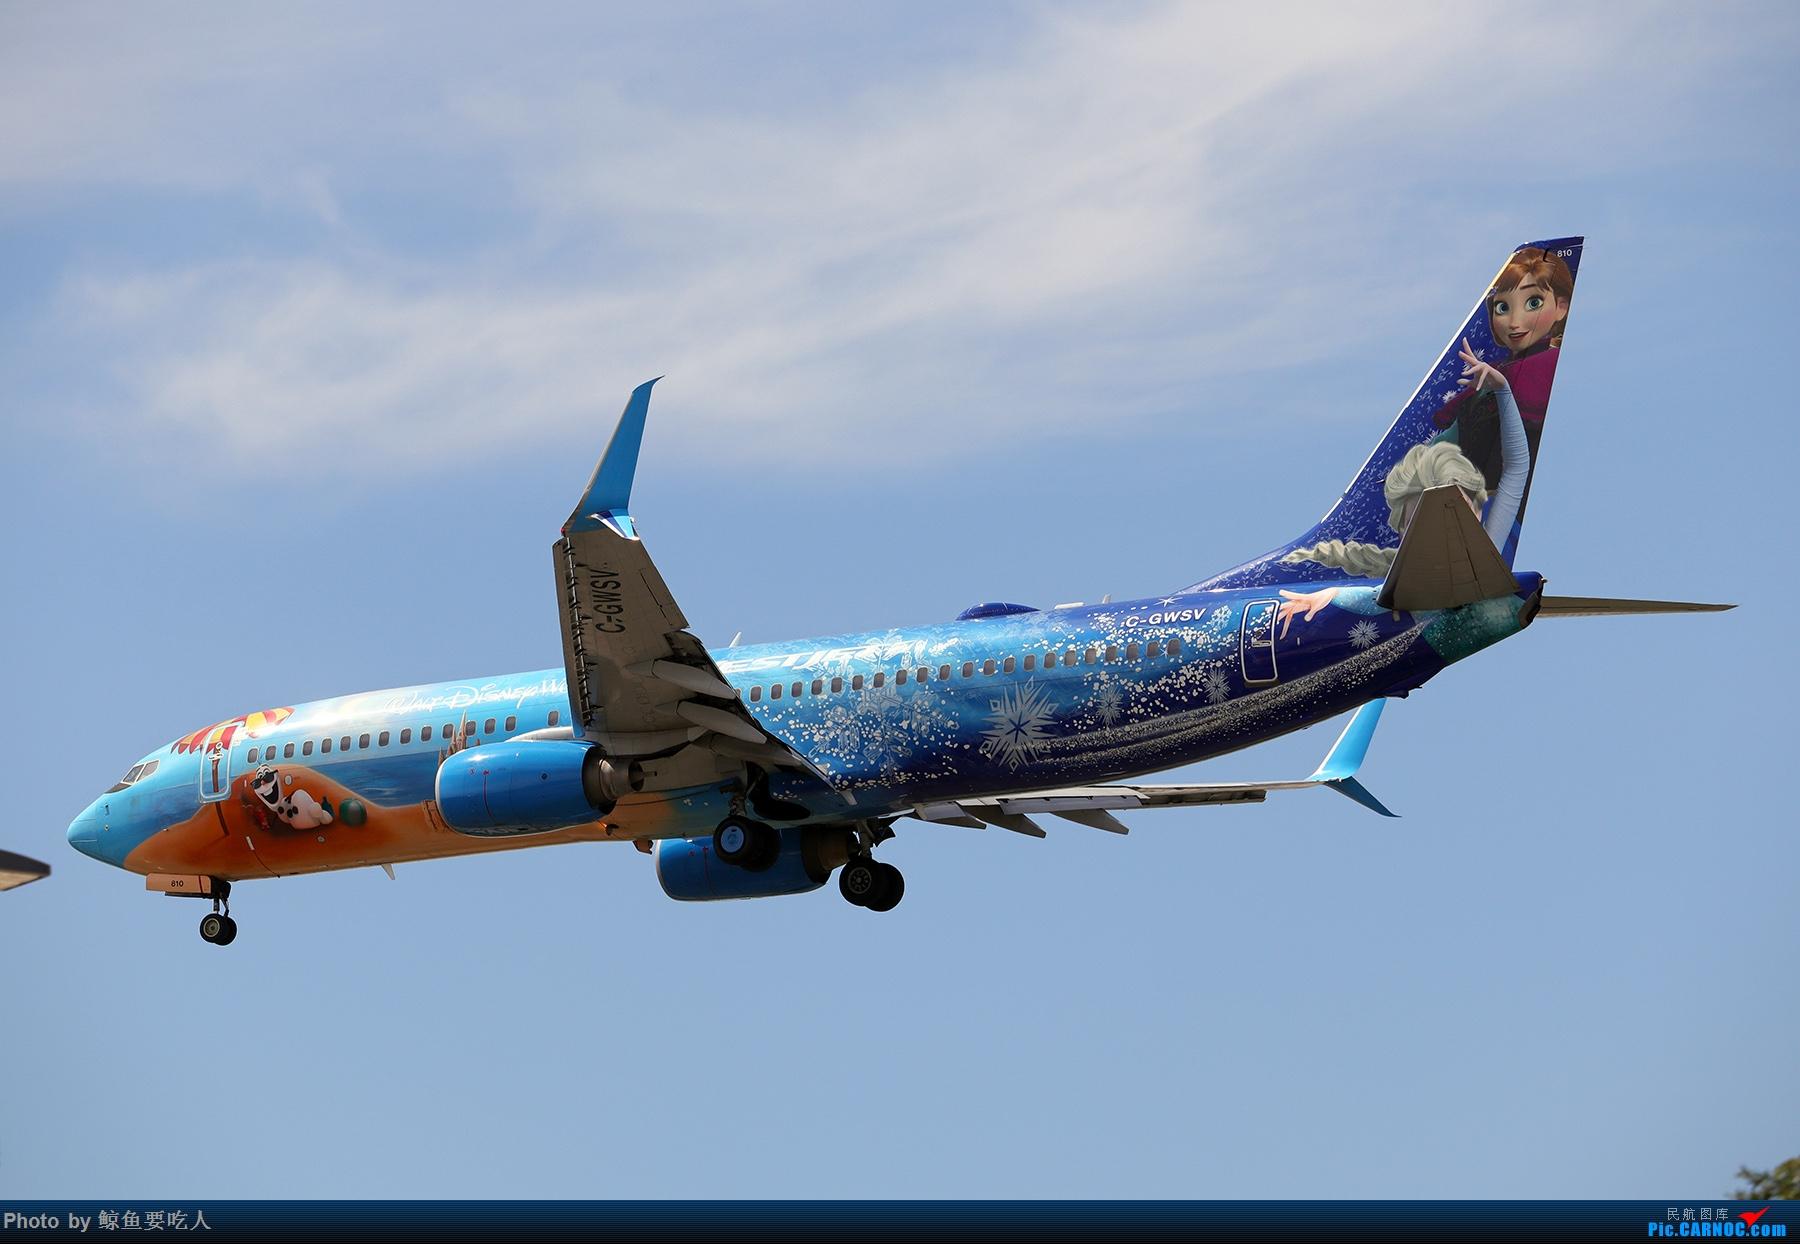 Re:[原创]【多图党】见证疫情后逐步的恢复,加拿大夏日多伦多皮尔逊机场拍机~ 乐见诸航空公司复航多伦多 BOEING 737-800 C-GWSV 多伦多皮尔逊国际机场